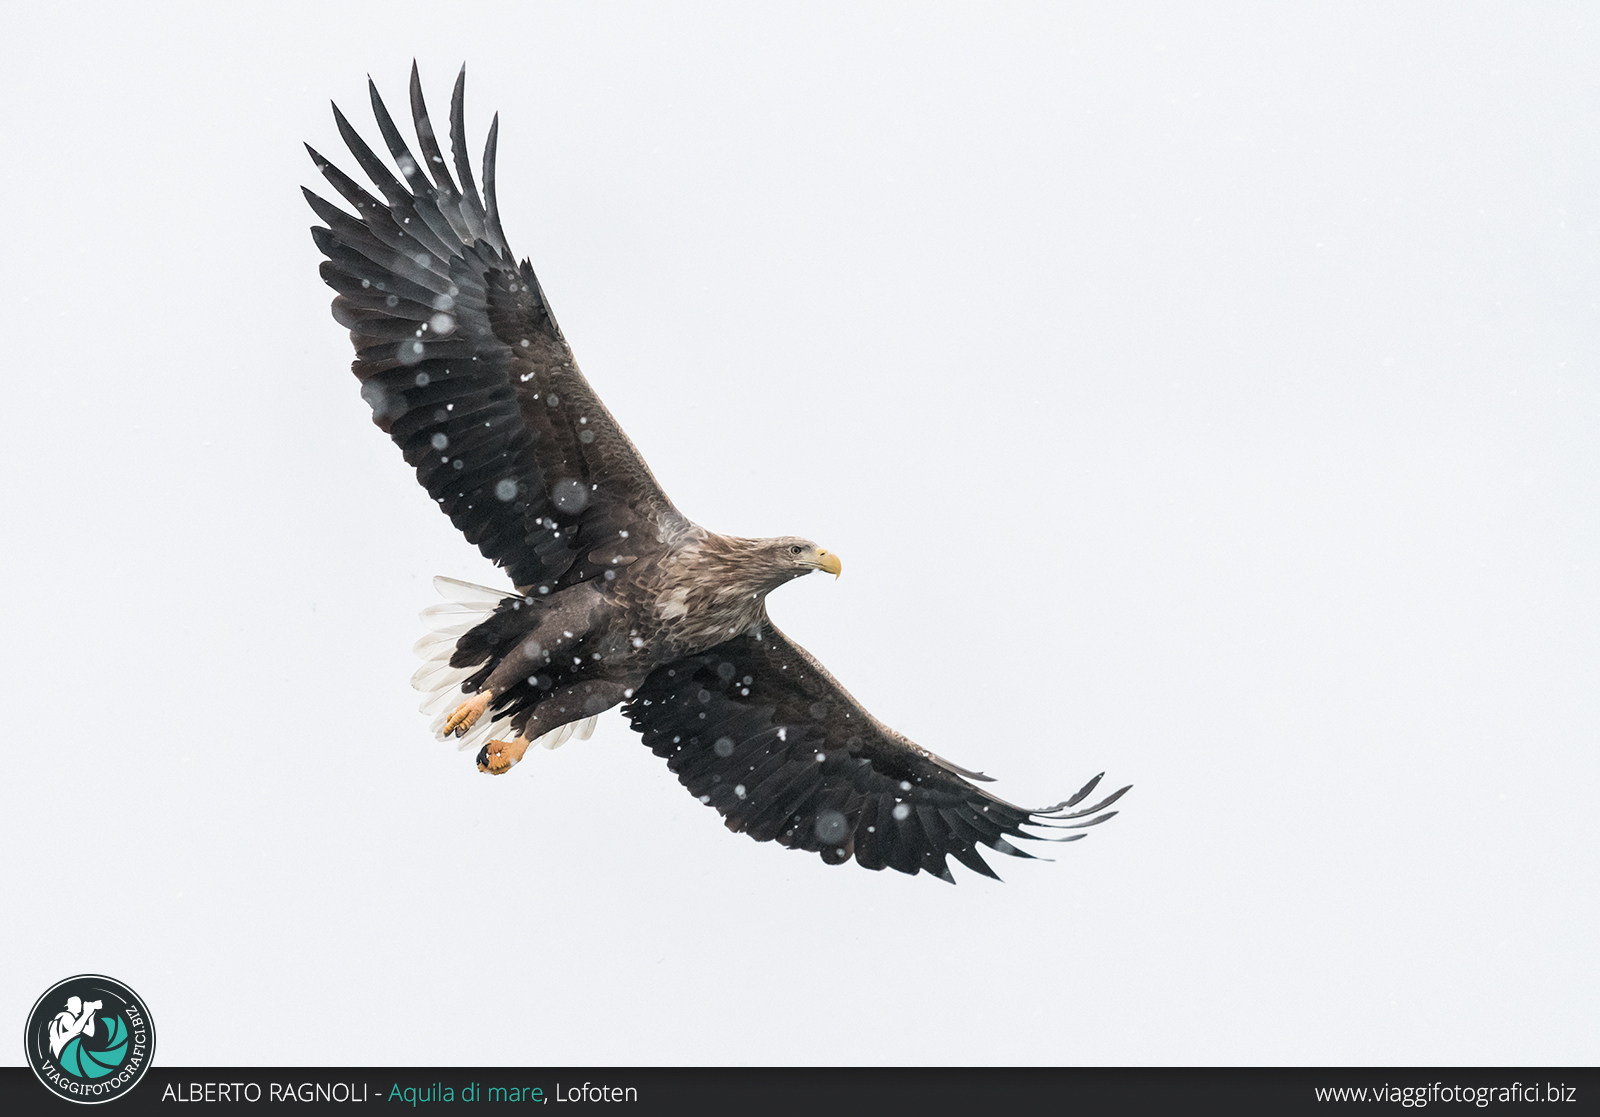 Aquila di mare in Norvegia